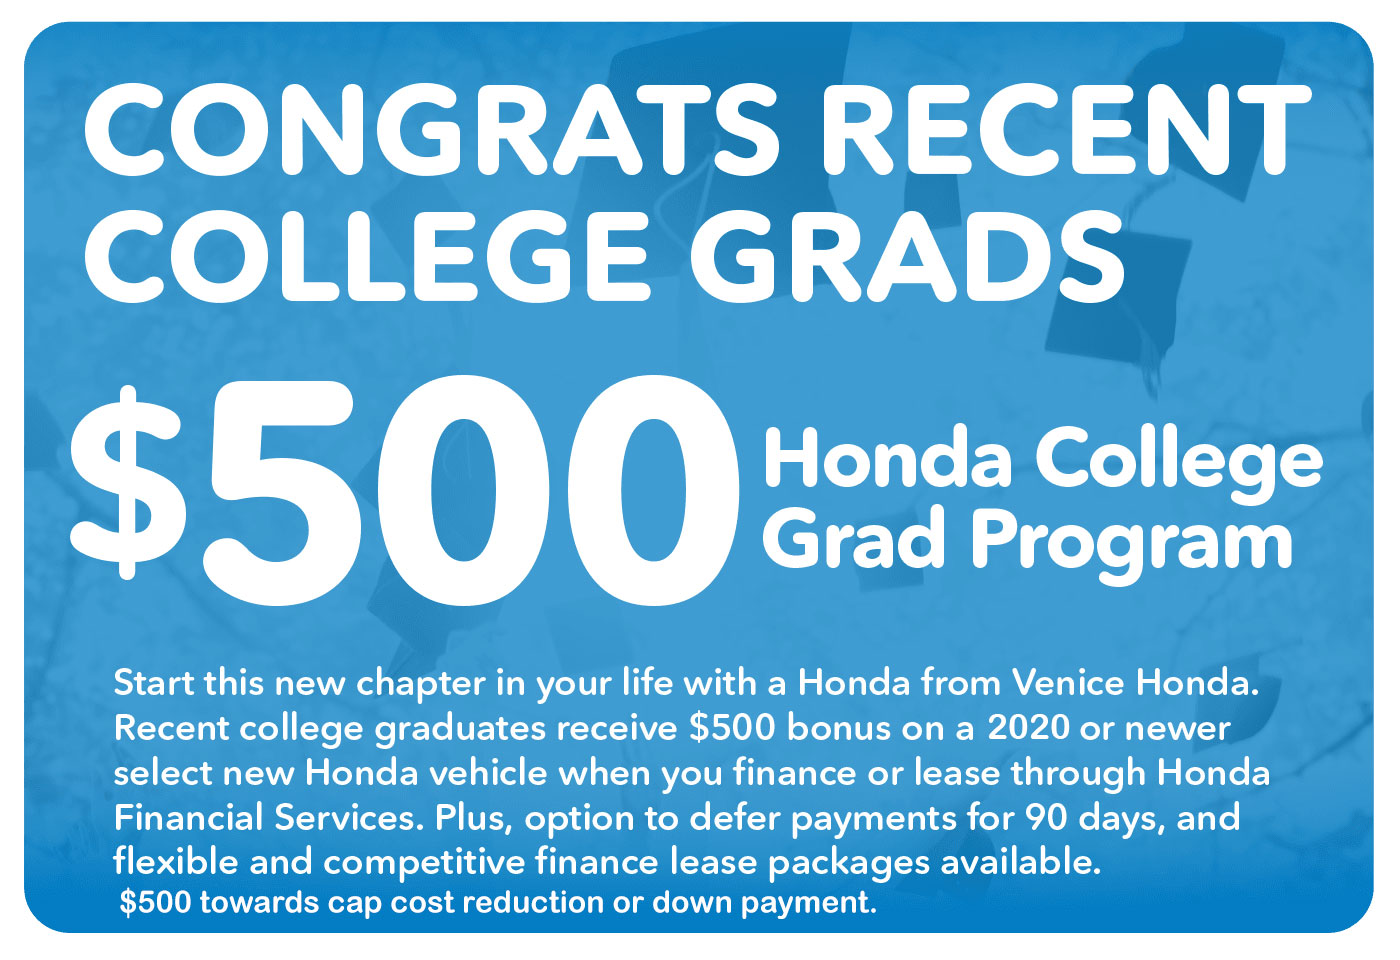 Congrats Recent College Grads. Receive $500 rebate with the Honda College Grad Program.